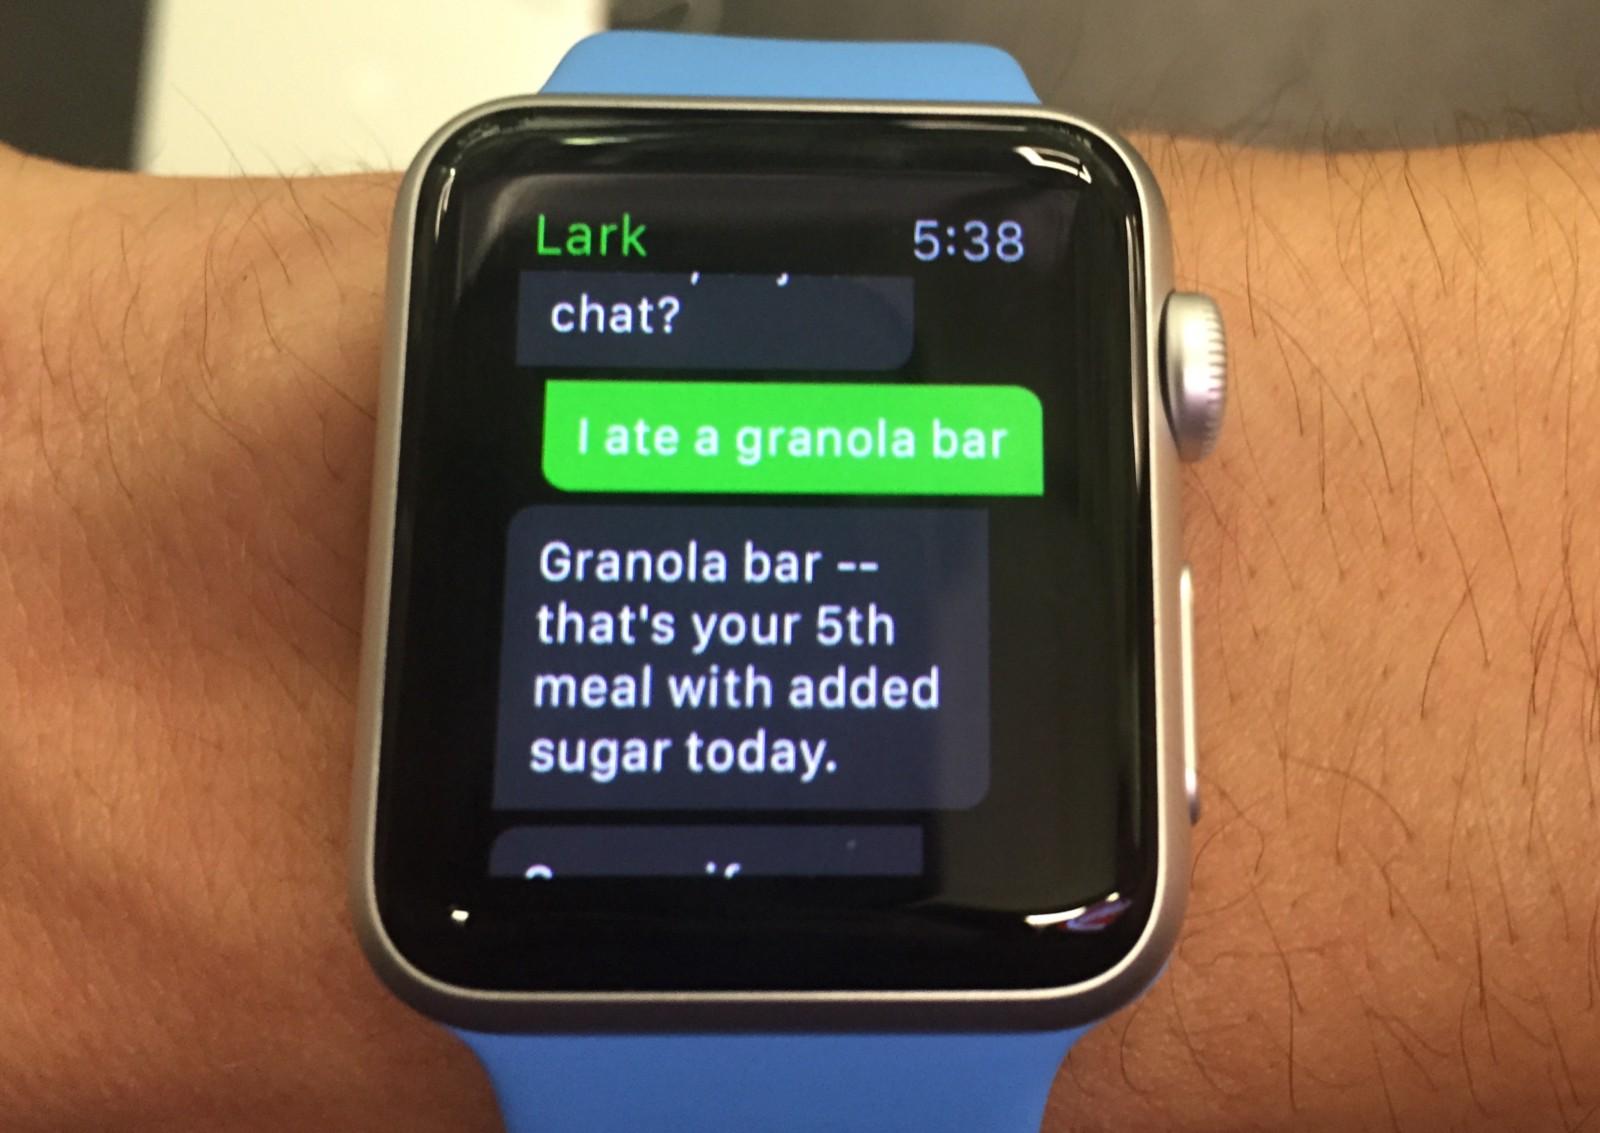 Lark Apple Watch food